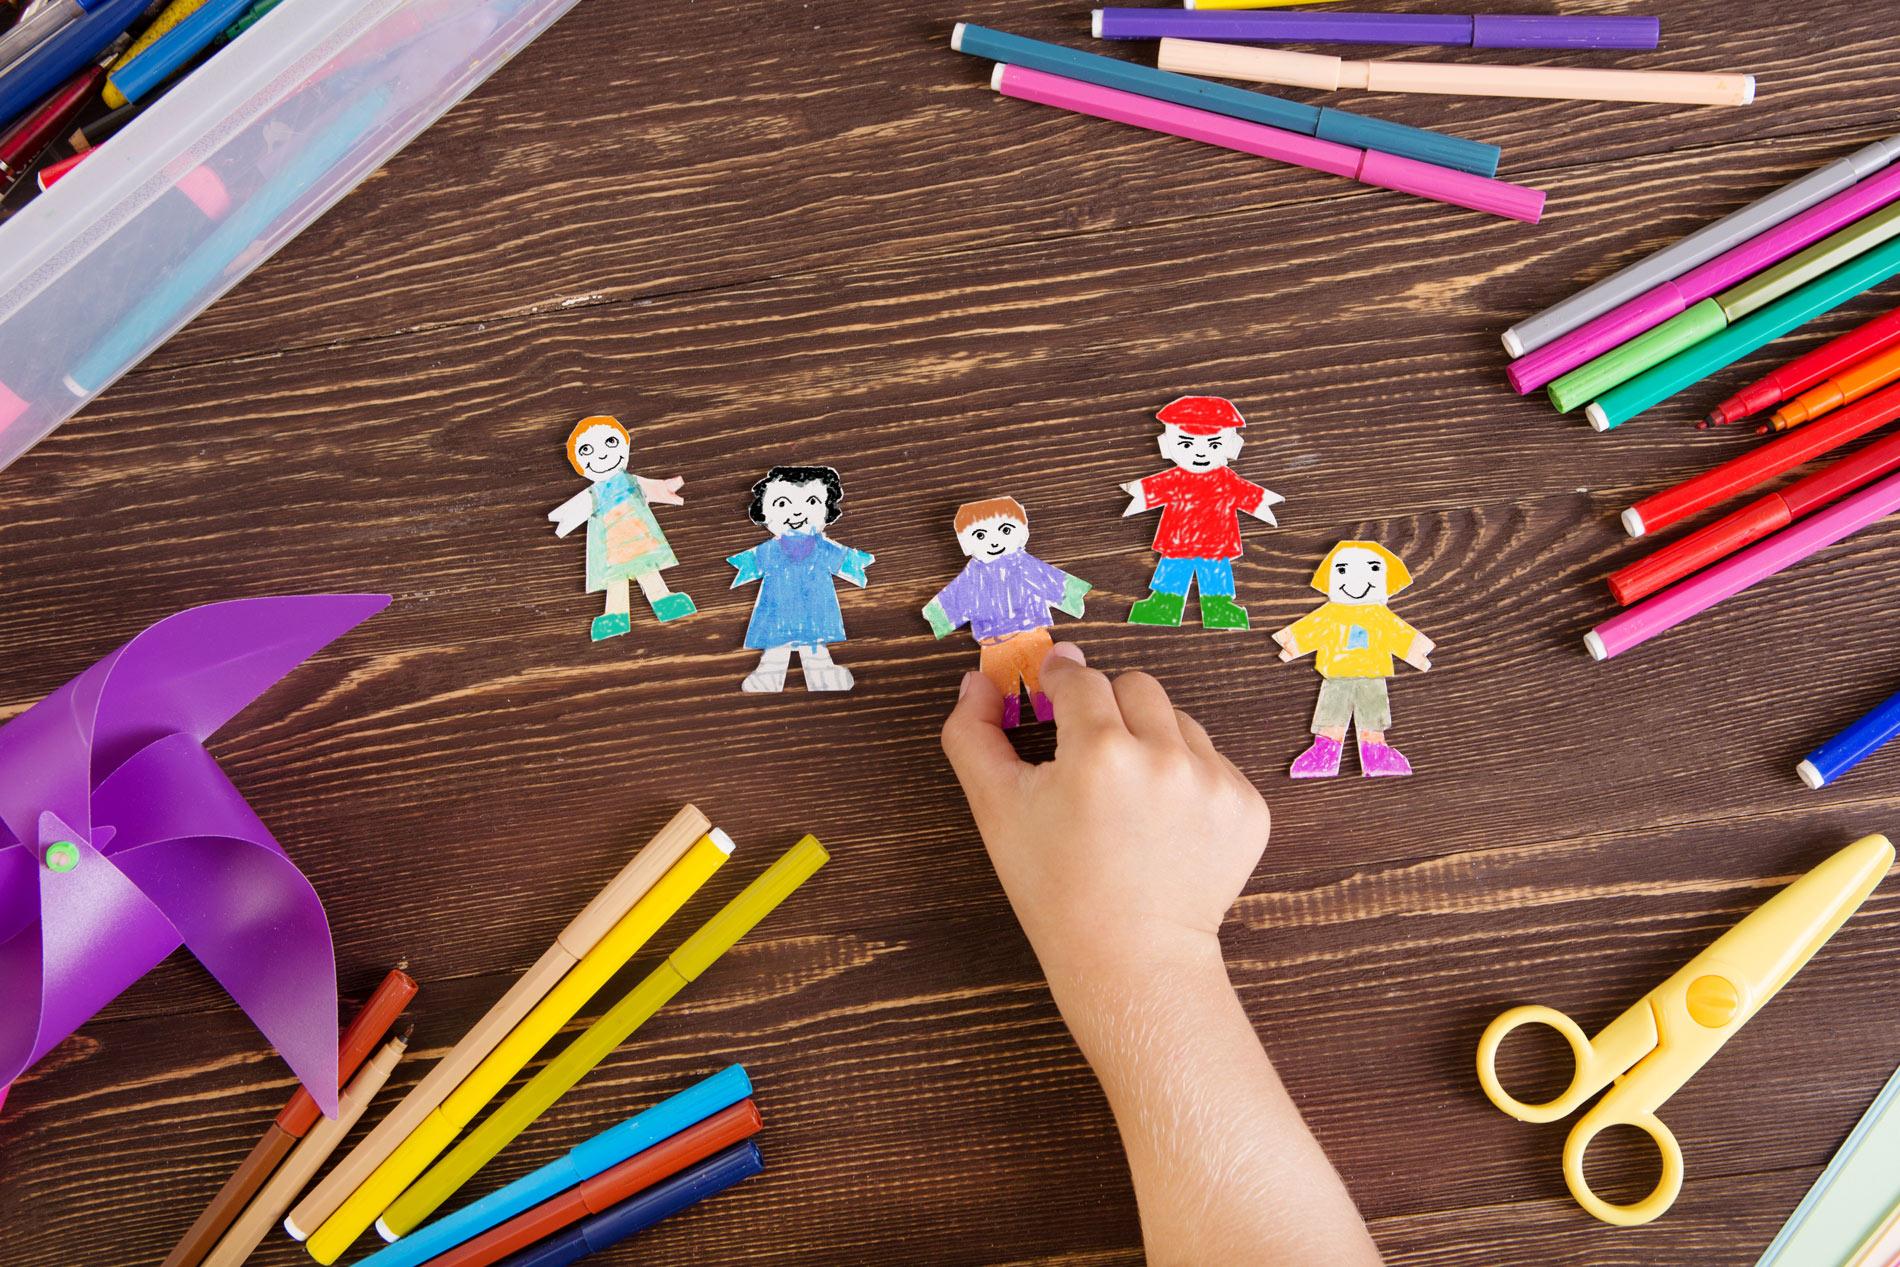 kindergarten ausbildung job